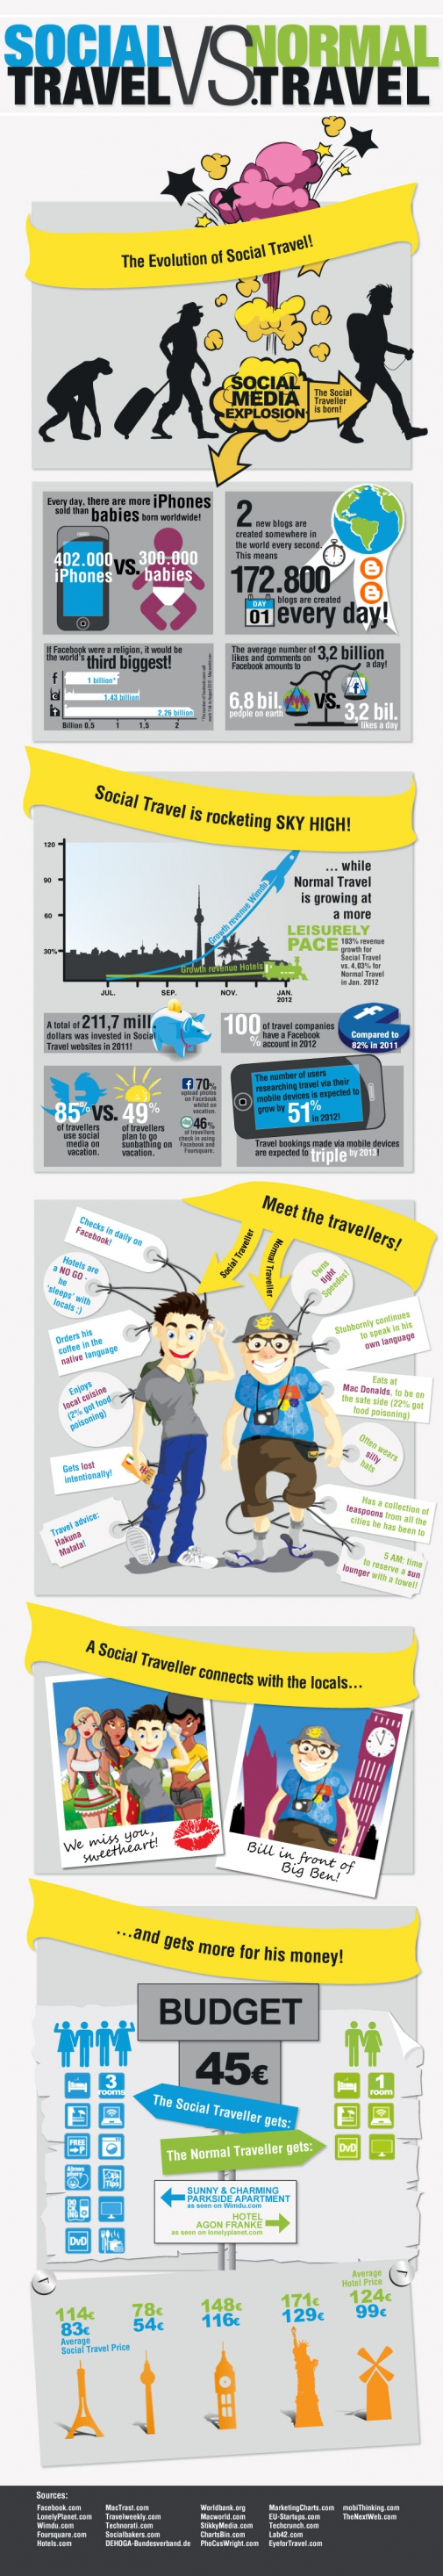 social-vs-normal-travel.jpg